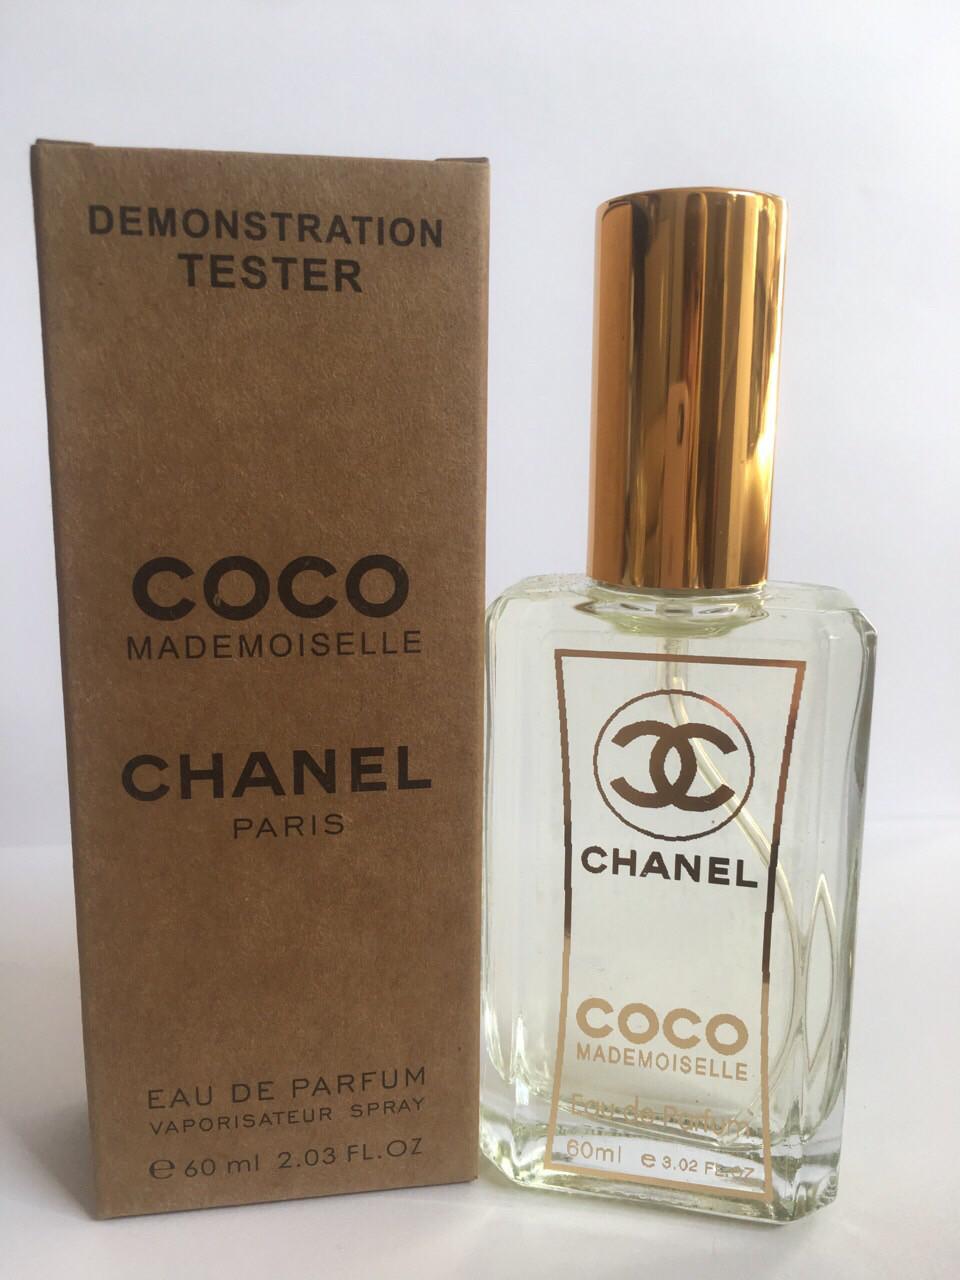 Жіночий тестер Chanel Coco Mademoiselle